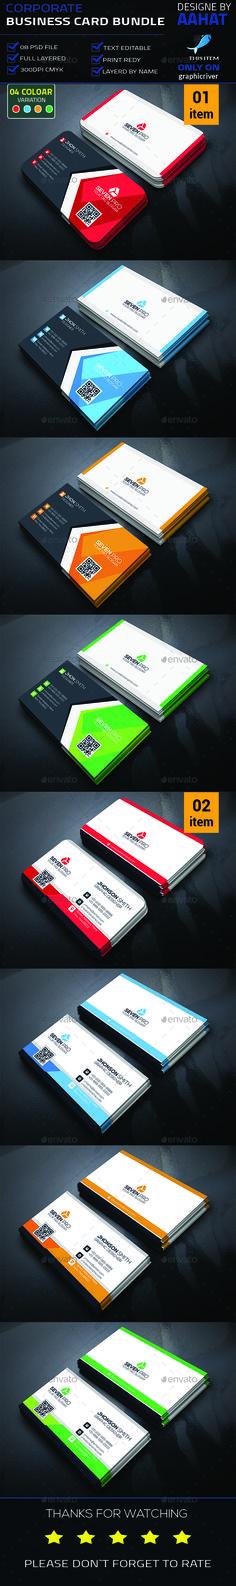 Corporate Business Card Template PSD Bundle. Download here: http://graphicriver.net/item/corporate-business-card-bundle/15788116?ref=ksioks